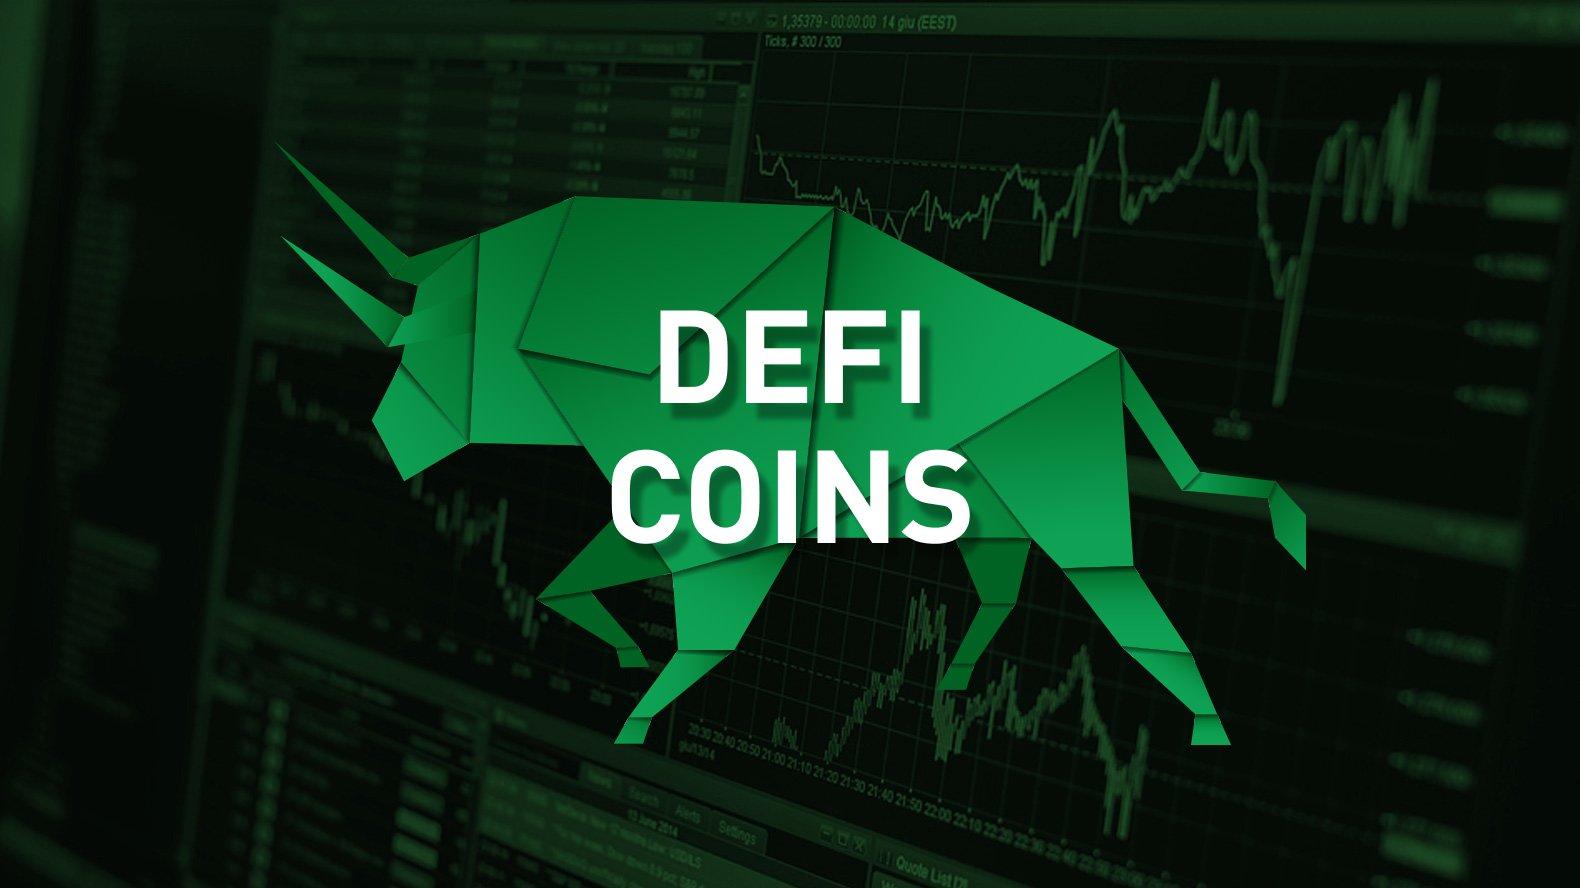 DeFi价格更新:DeFi硬币在强劲的每月表??现之后开始醒来-AAVE,COM,SNX,UNI-下